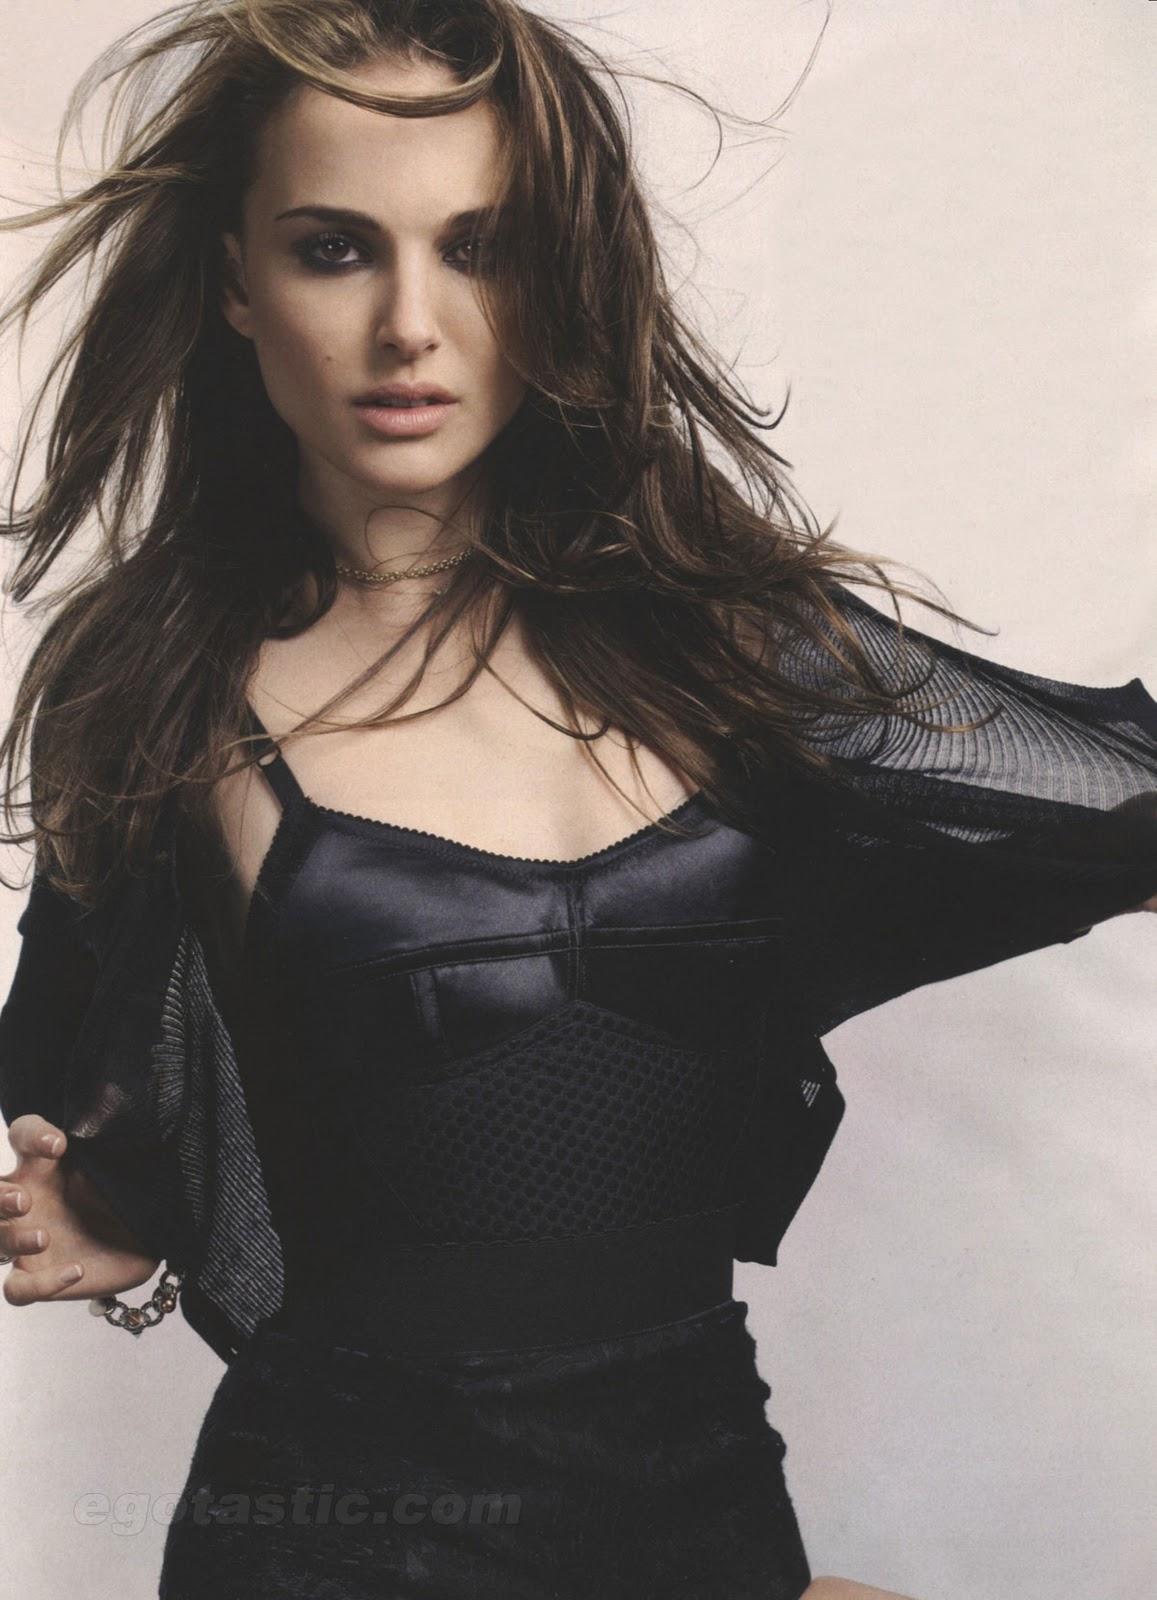 http://4.bp.blogspot.com/_WDCWEjl45FQ/TUNW9UzlYOI/AAAAAAAADtI/GZW0x_s05Bc/s1600/natalie-portman-who-mag-sexiest-women-01.jpg